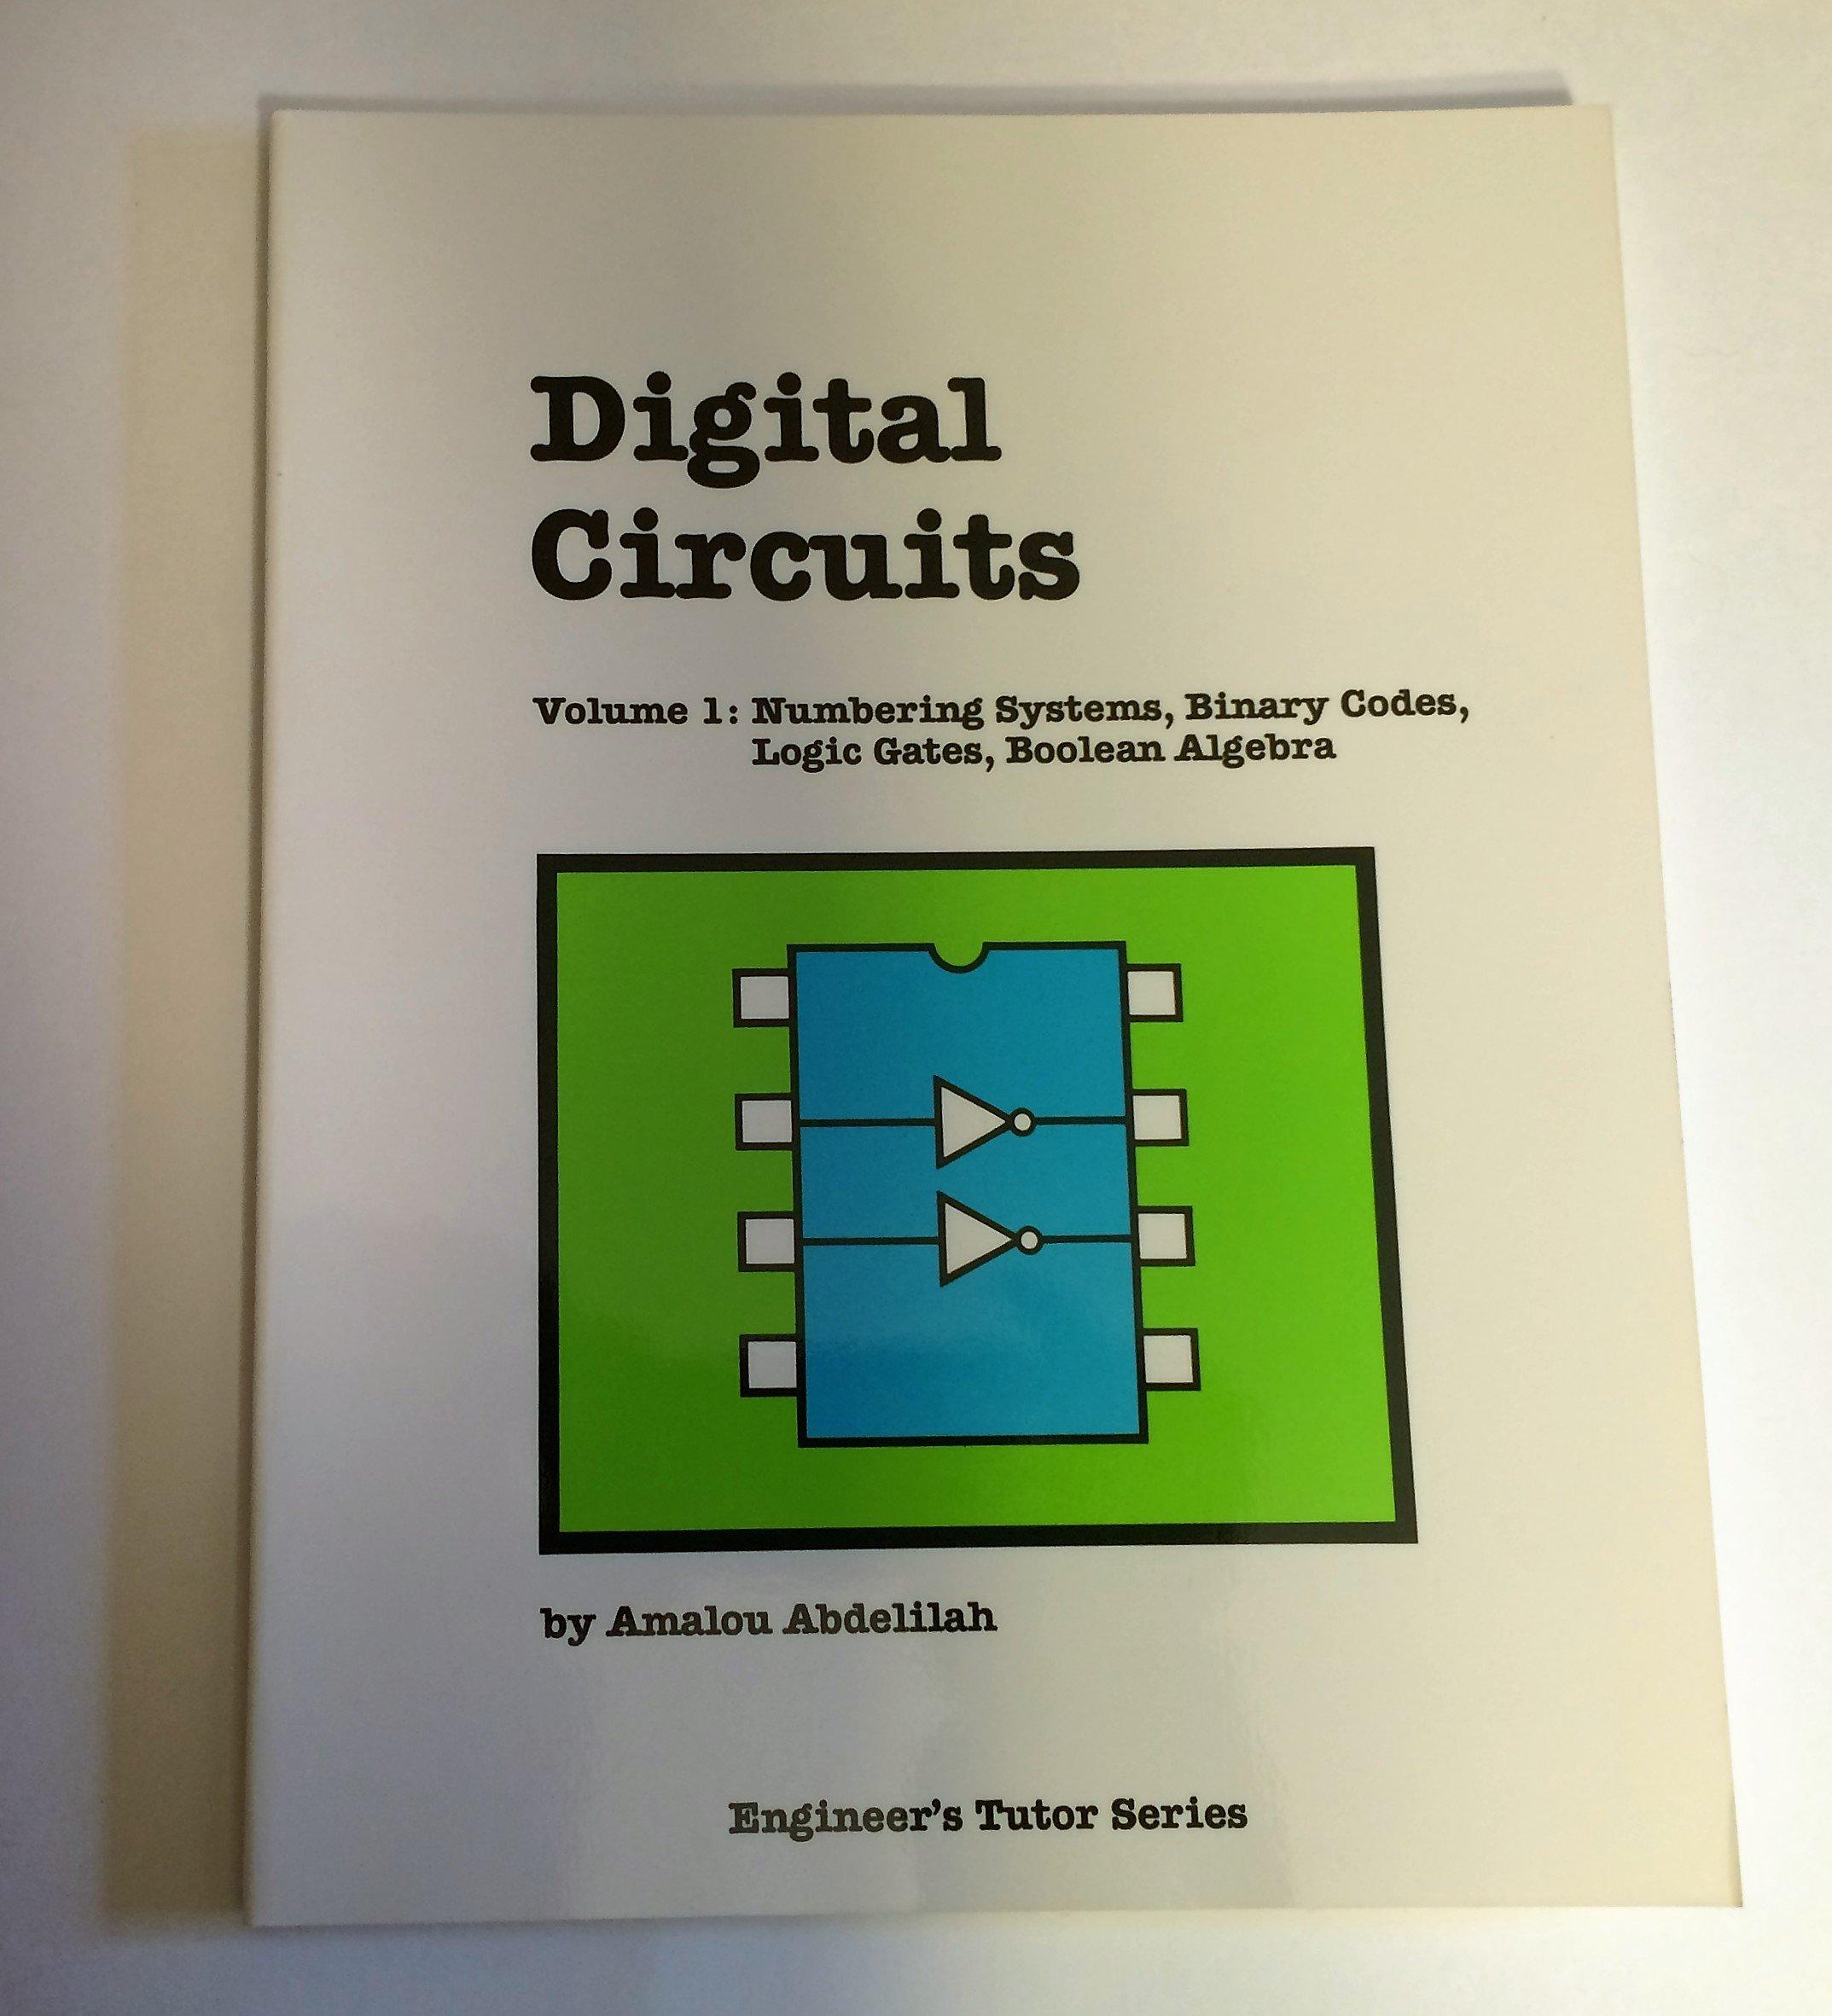 001 Digital Circuits Numbering Systems Binary Codes Logic Gates Circuit Using Boolean Algebra Engineers Tutor Series Amalou Abdelilah 9780938862673